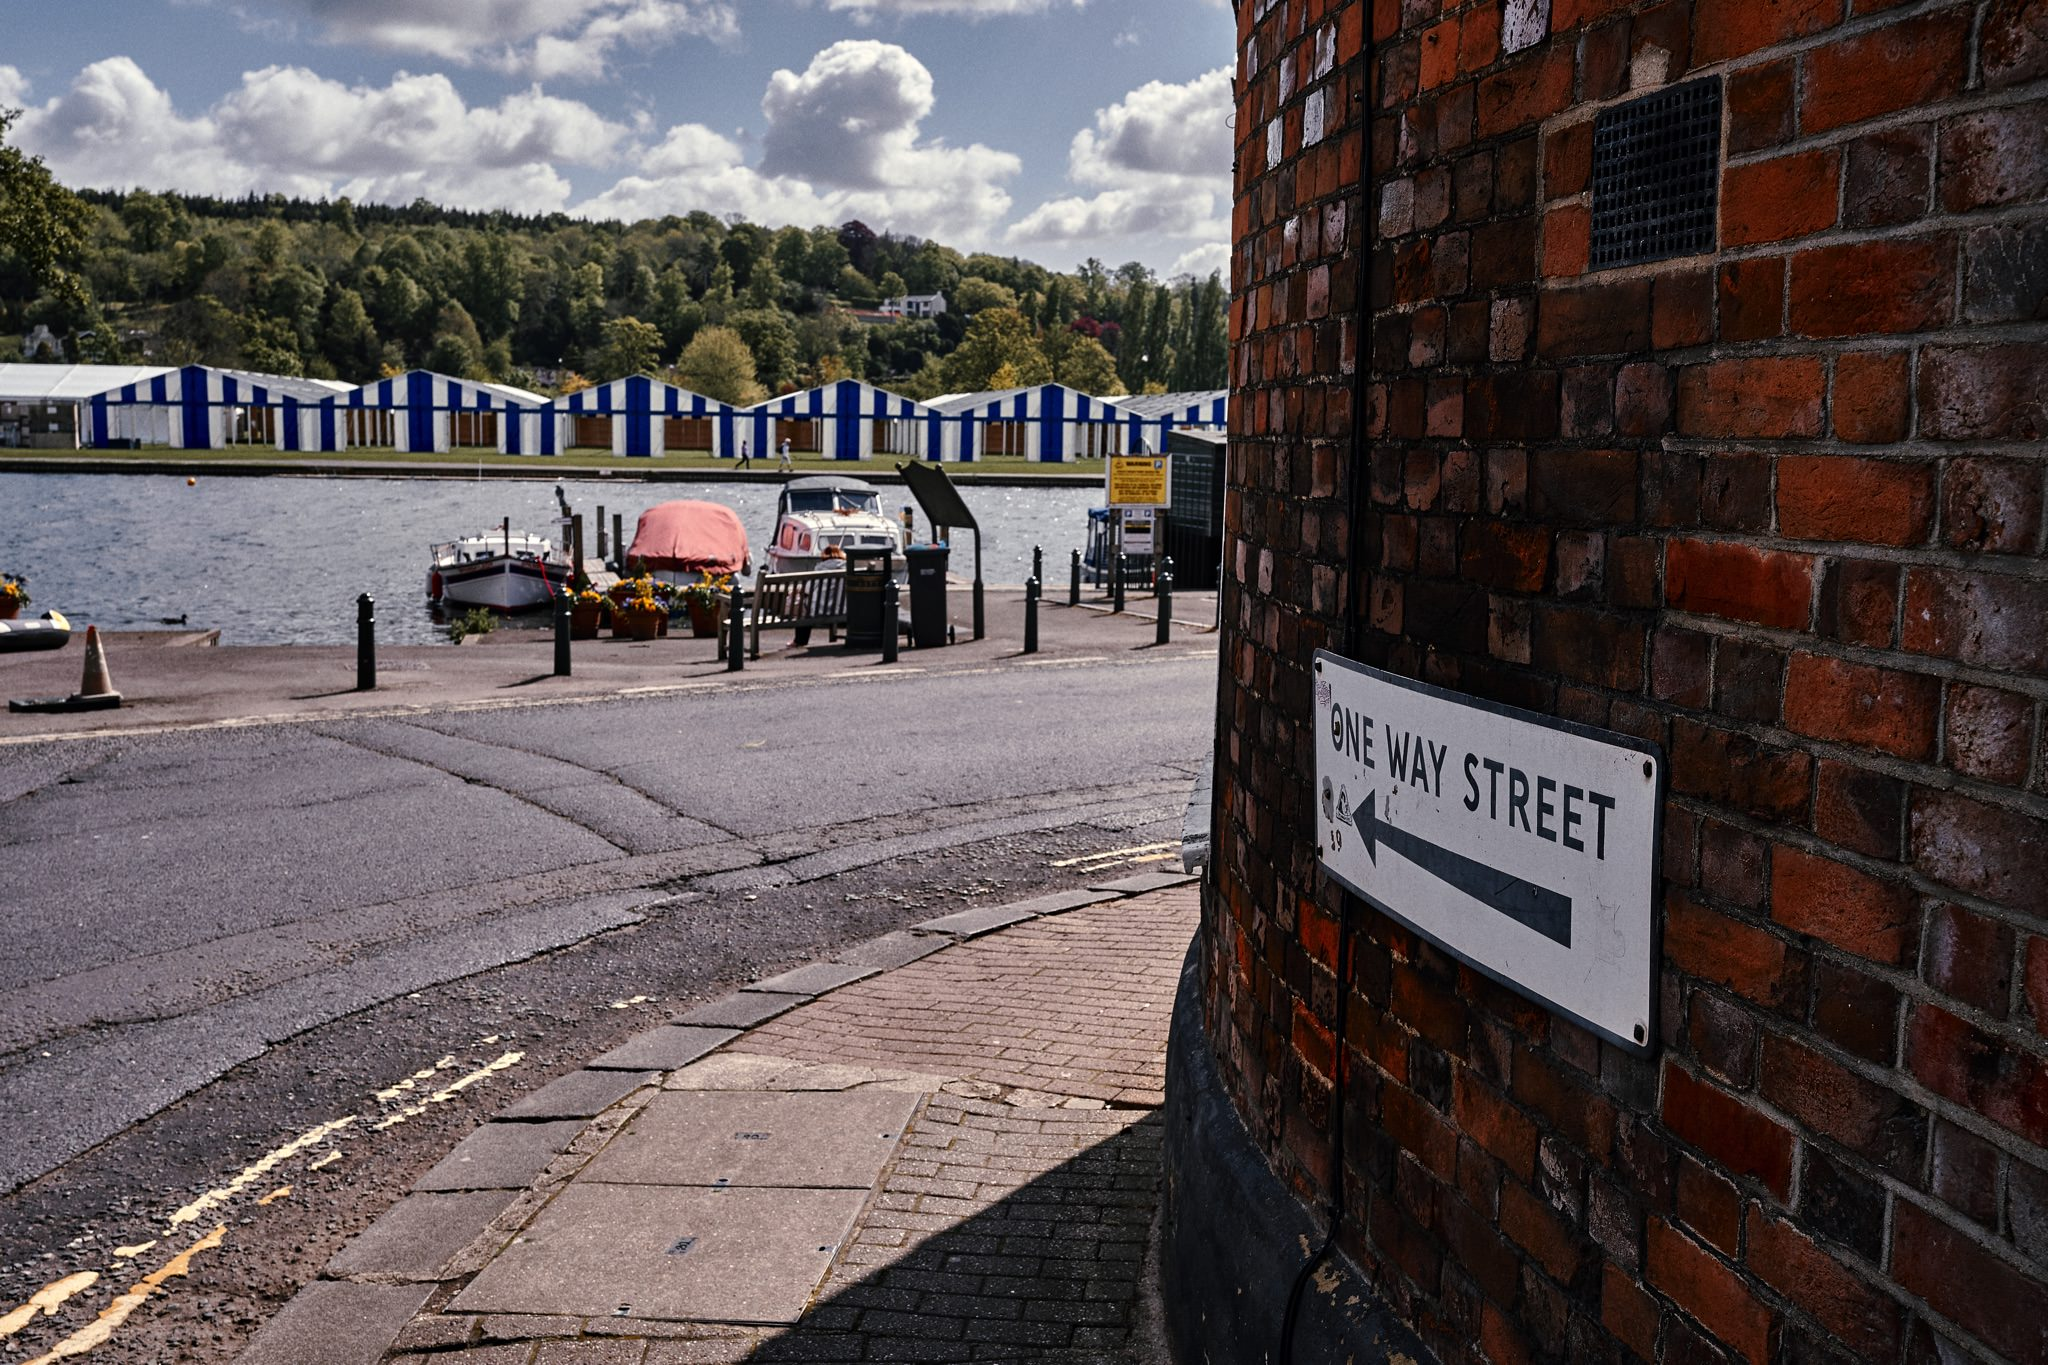 Streets around Hotel Du Vin, Henley-on-Thames